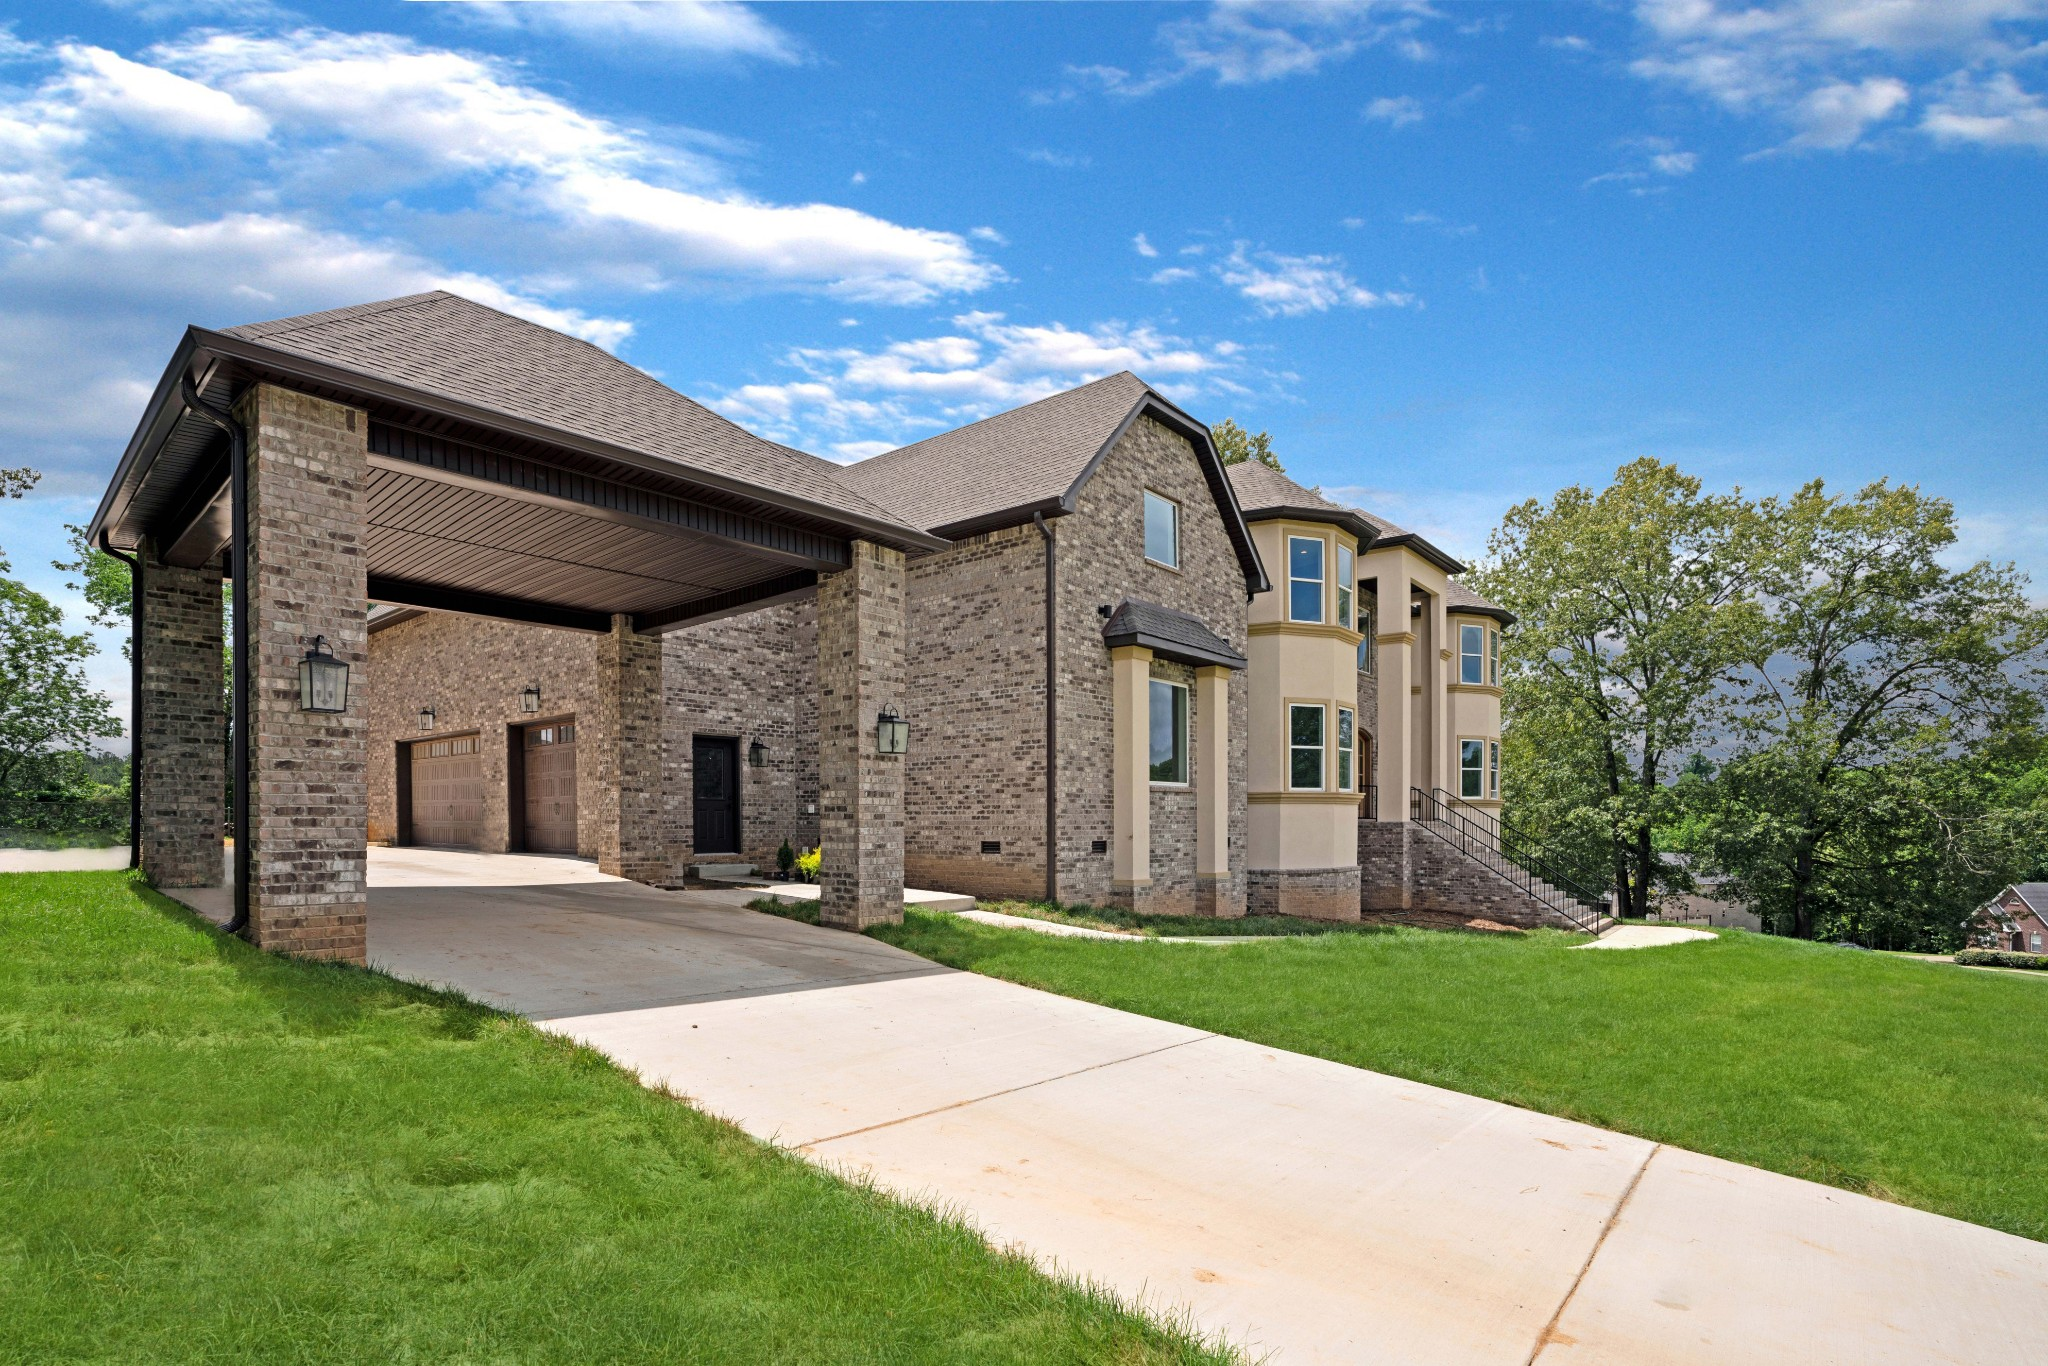 2075 Mossy Oak Cir, Clarksville, TN 37043 - Clarksville, TN real estate listing